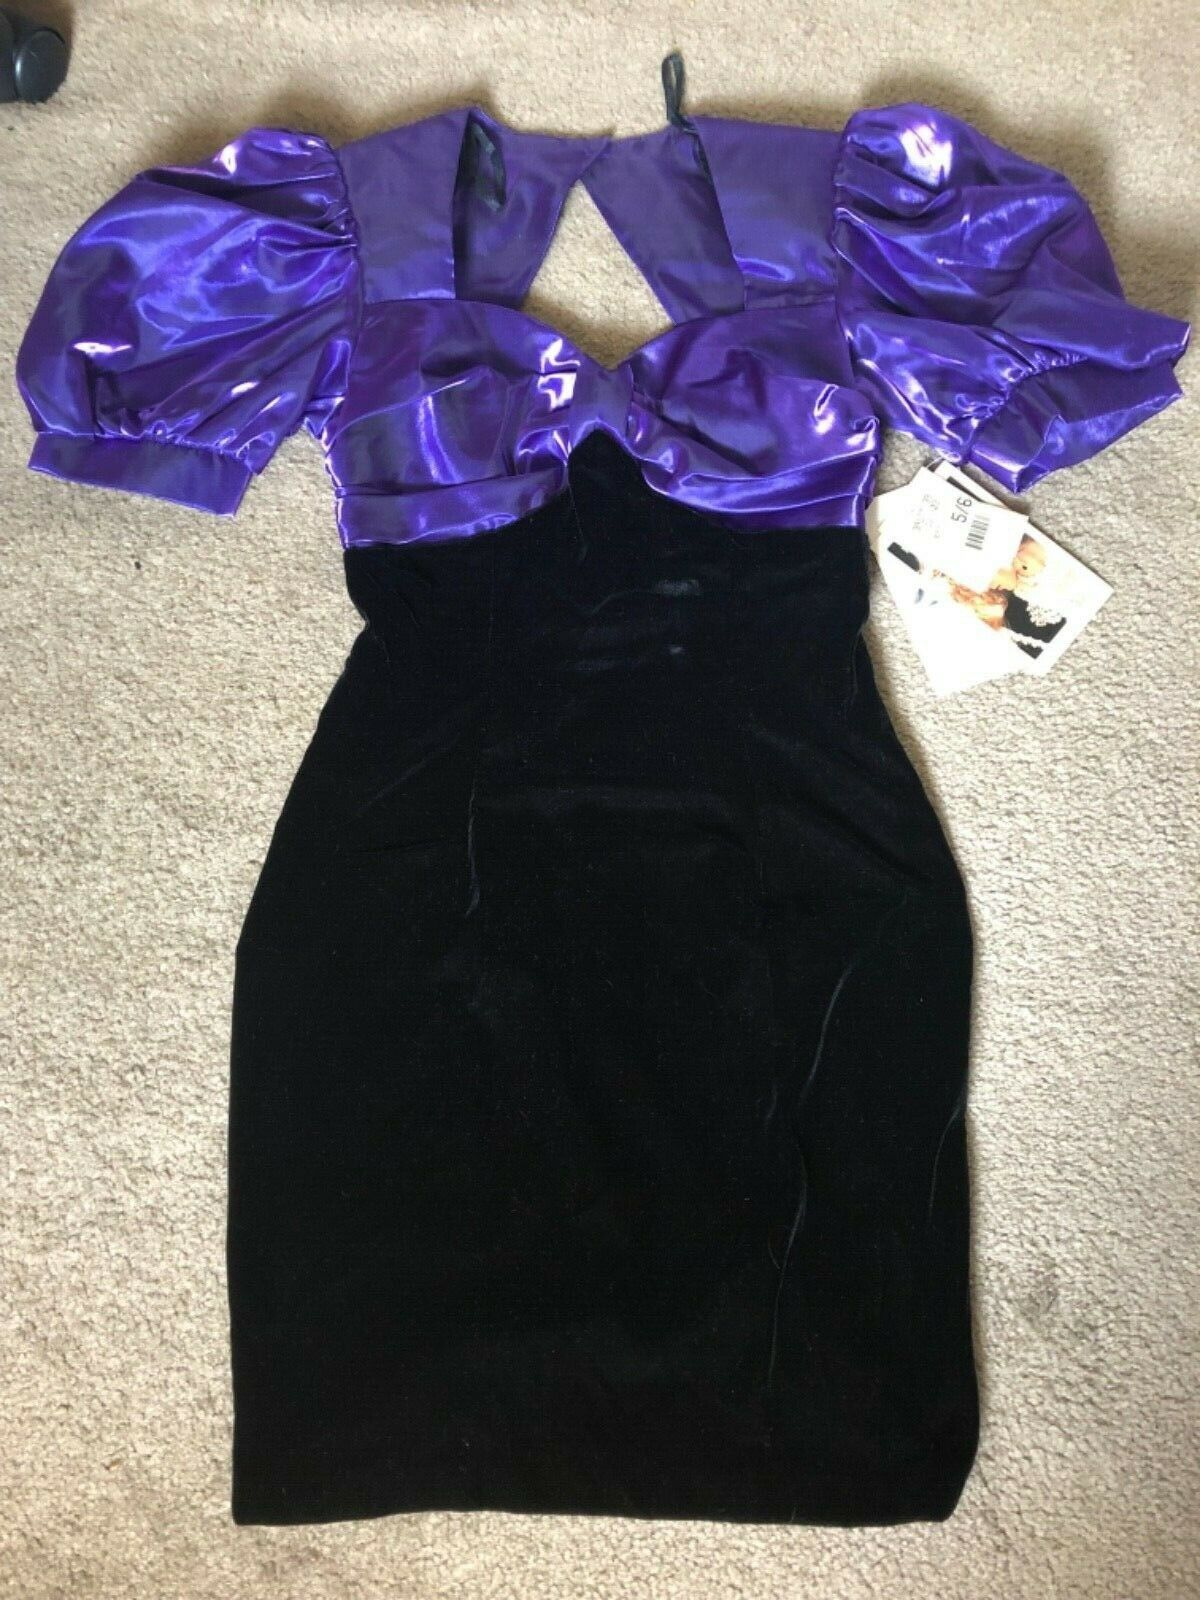 Vintage 1980s Deadstock Jessica McClintock Dress  - image 1